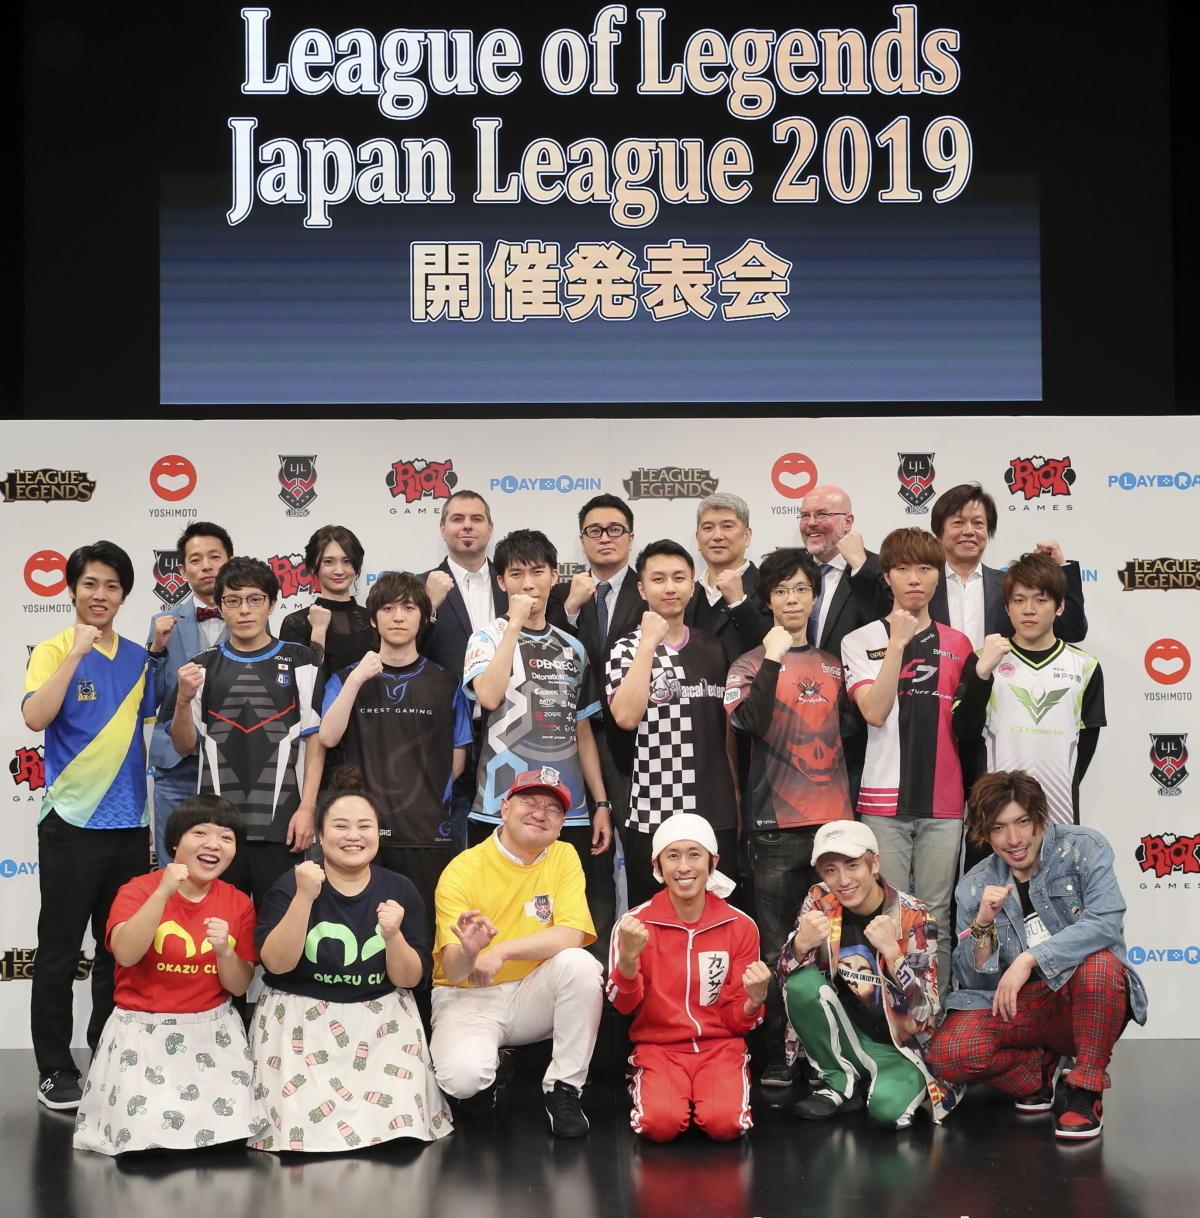 http://news.yoshimoto.co.jp/20181226153401-f113598c390c933b7e10b8f335eca0f880ea52e1.jpg